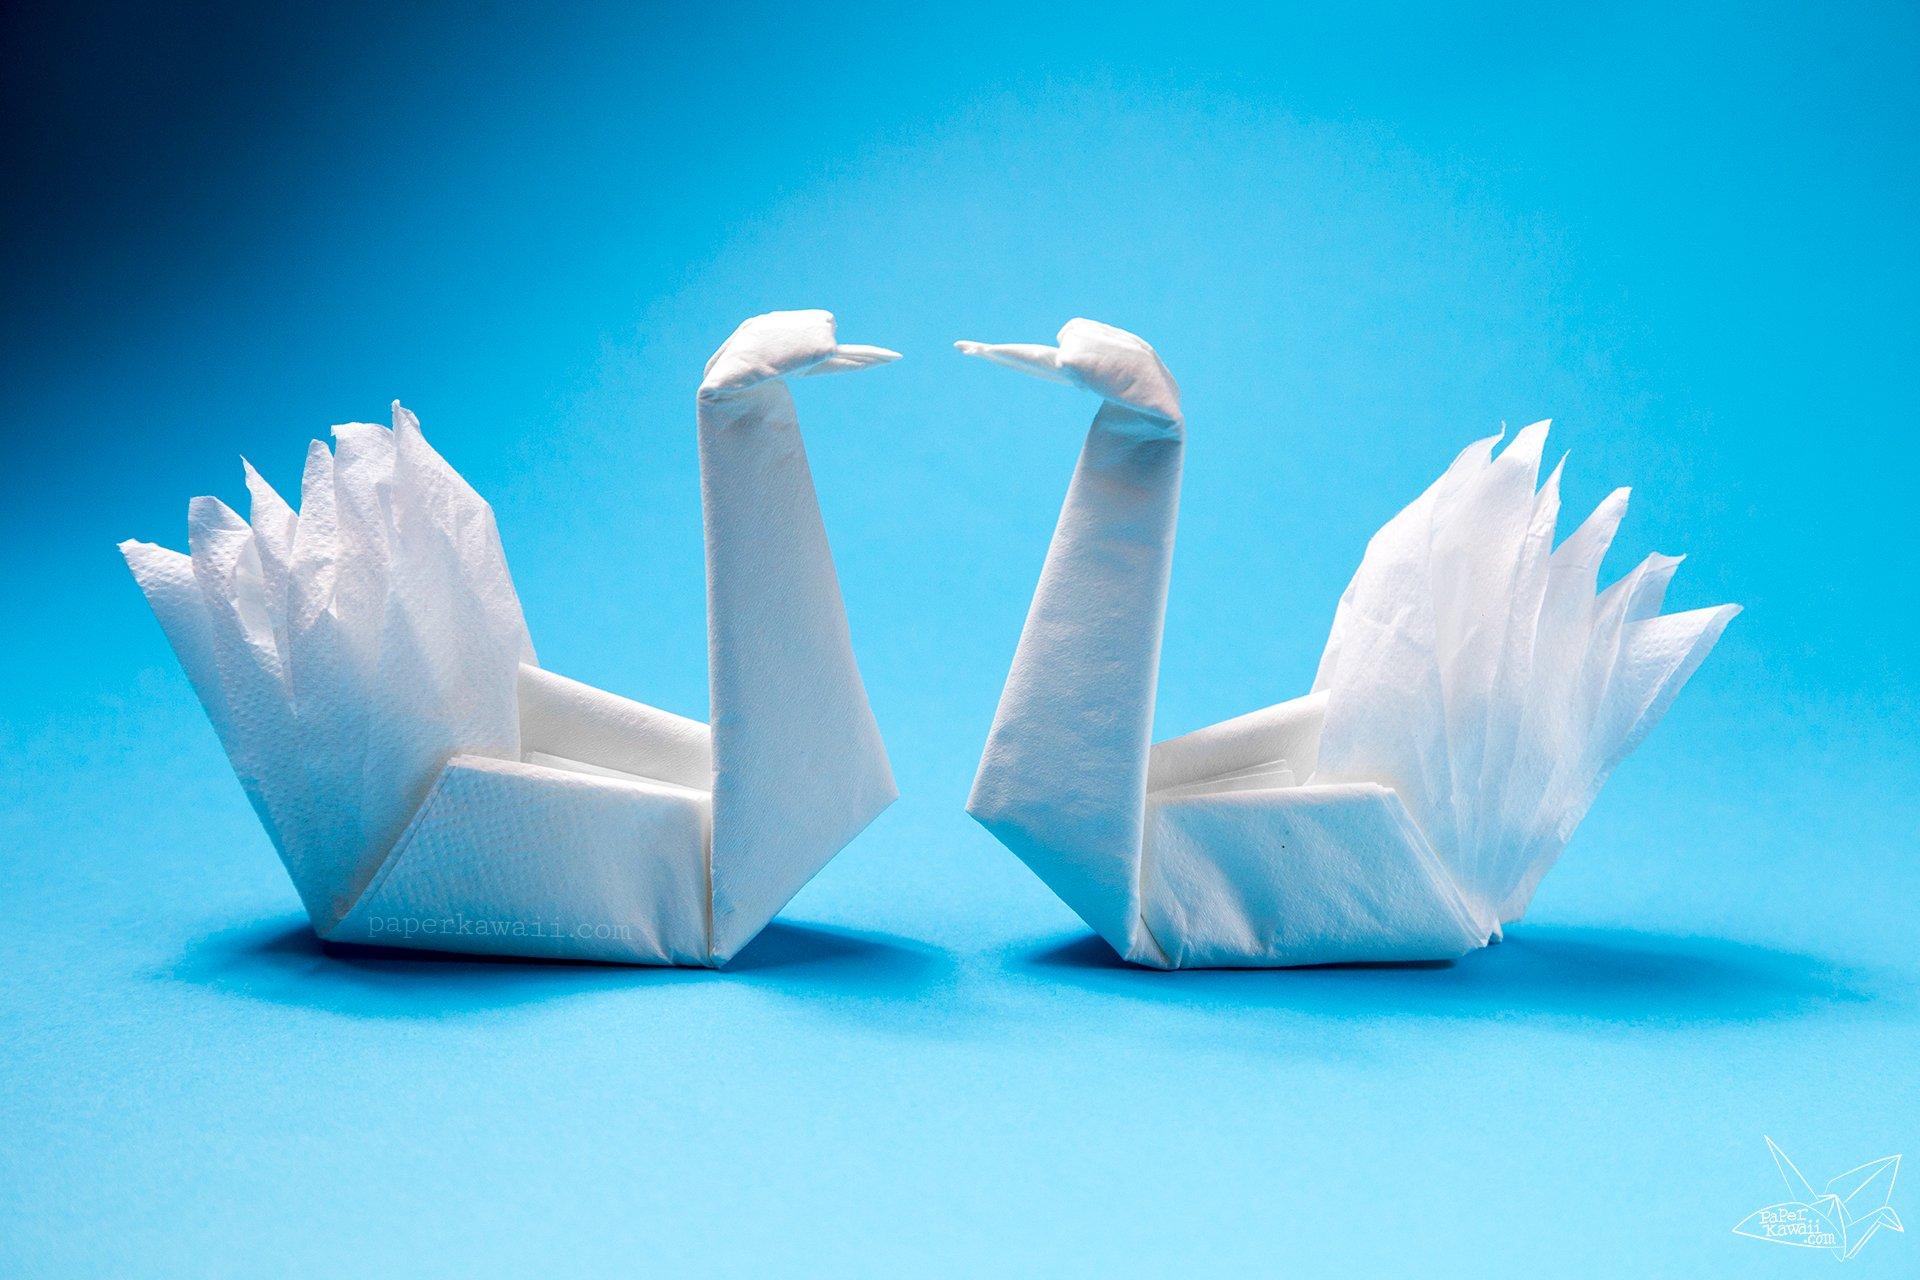 Easy Origami Napkin Swan Tutorial - Paper Kawaii - photo#20